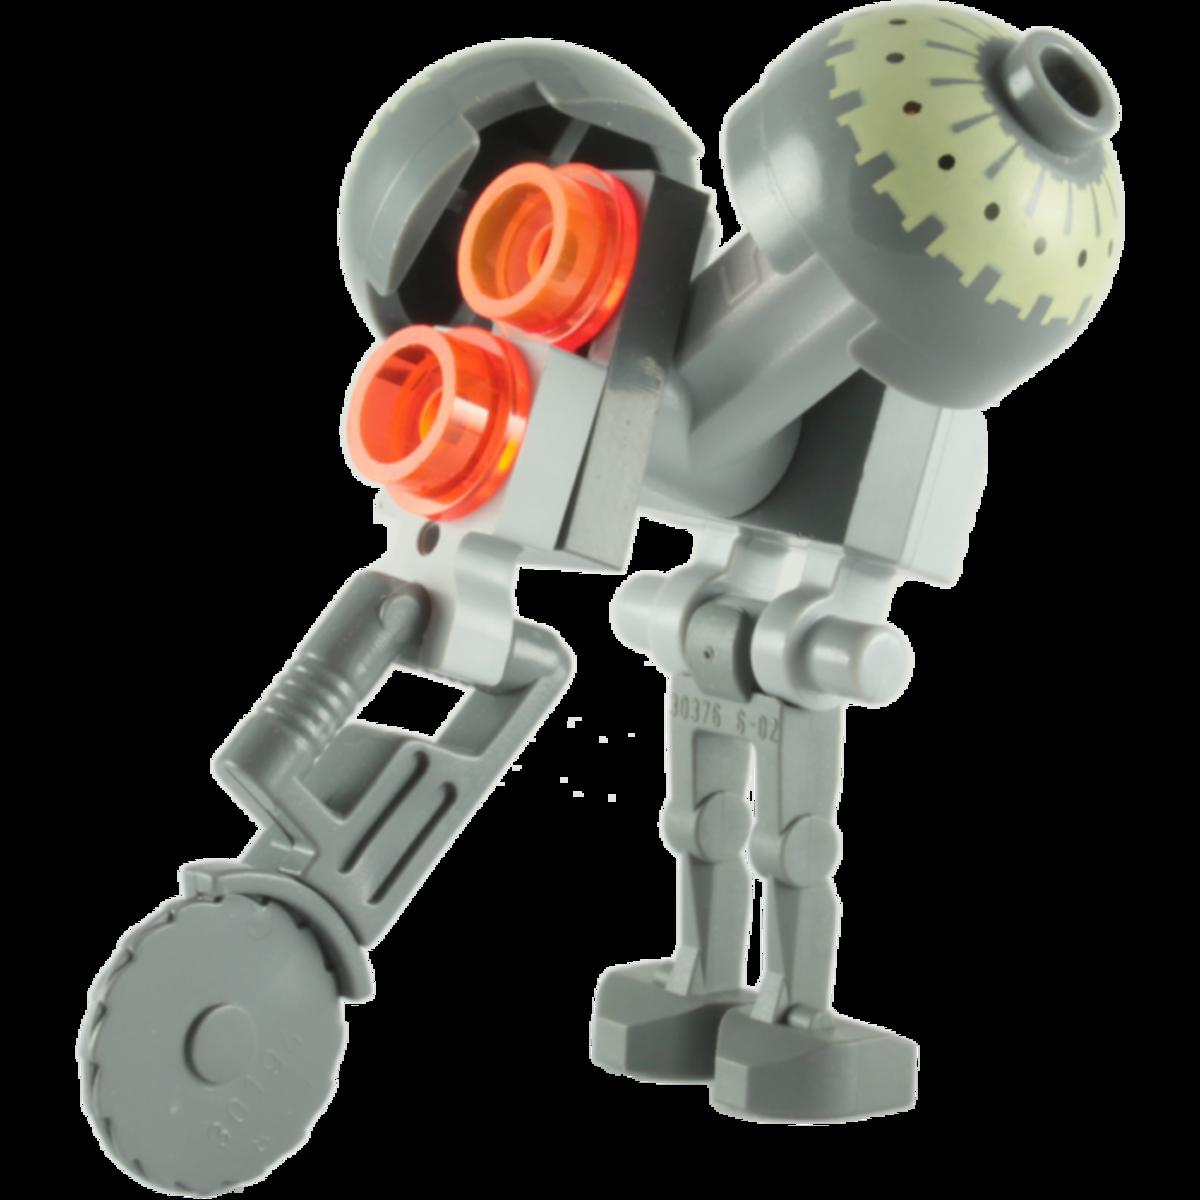 LEGO Star Wars Droid Tri-Fighter 7252 Buzz Droid Minifigure